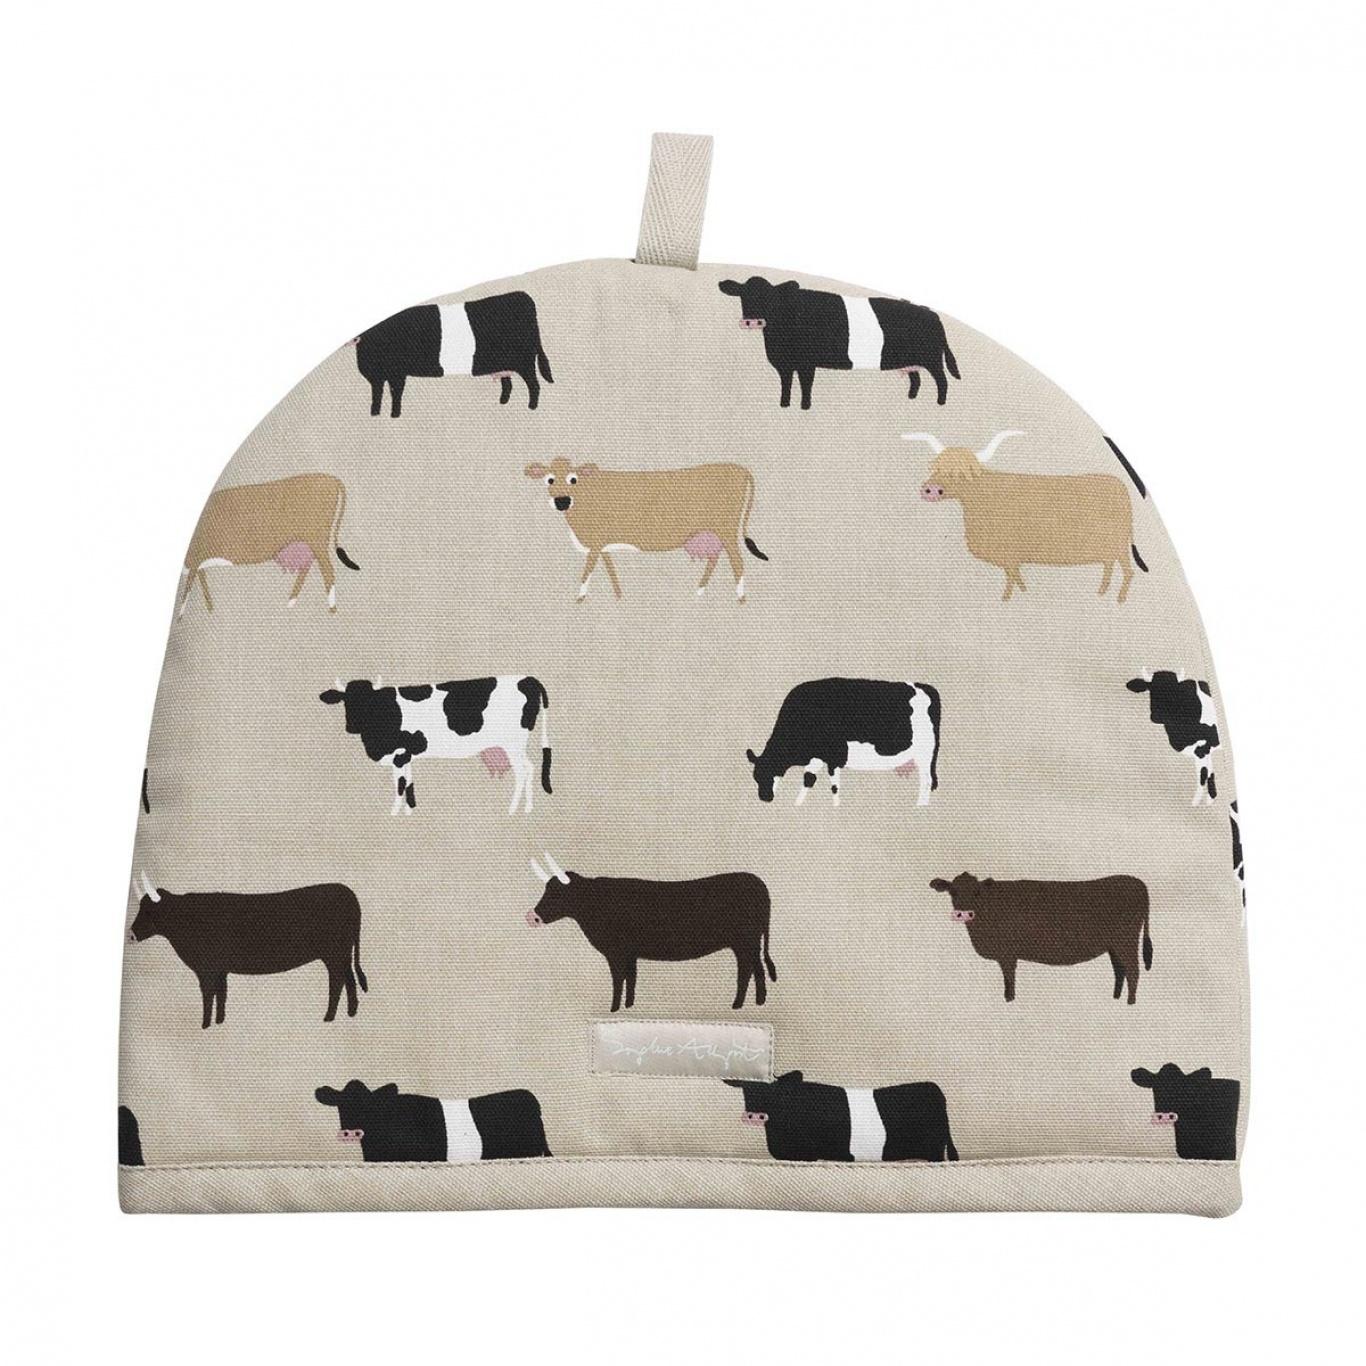 Image of Sophie Allport Cows Tea Cosy